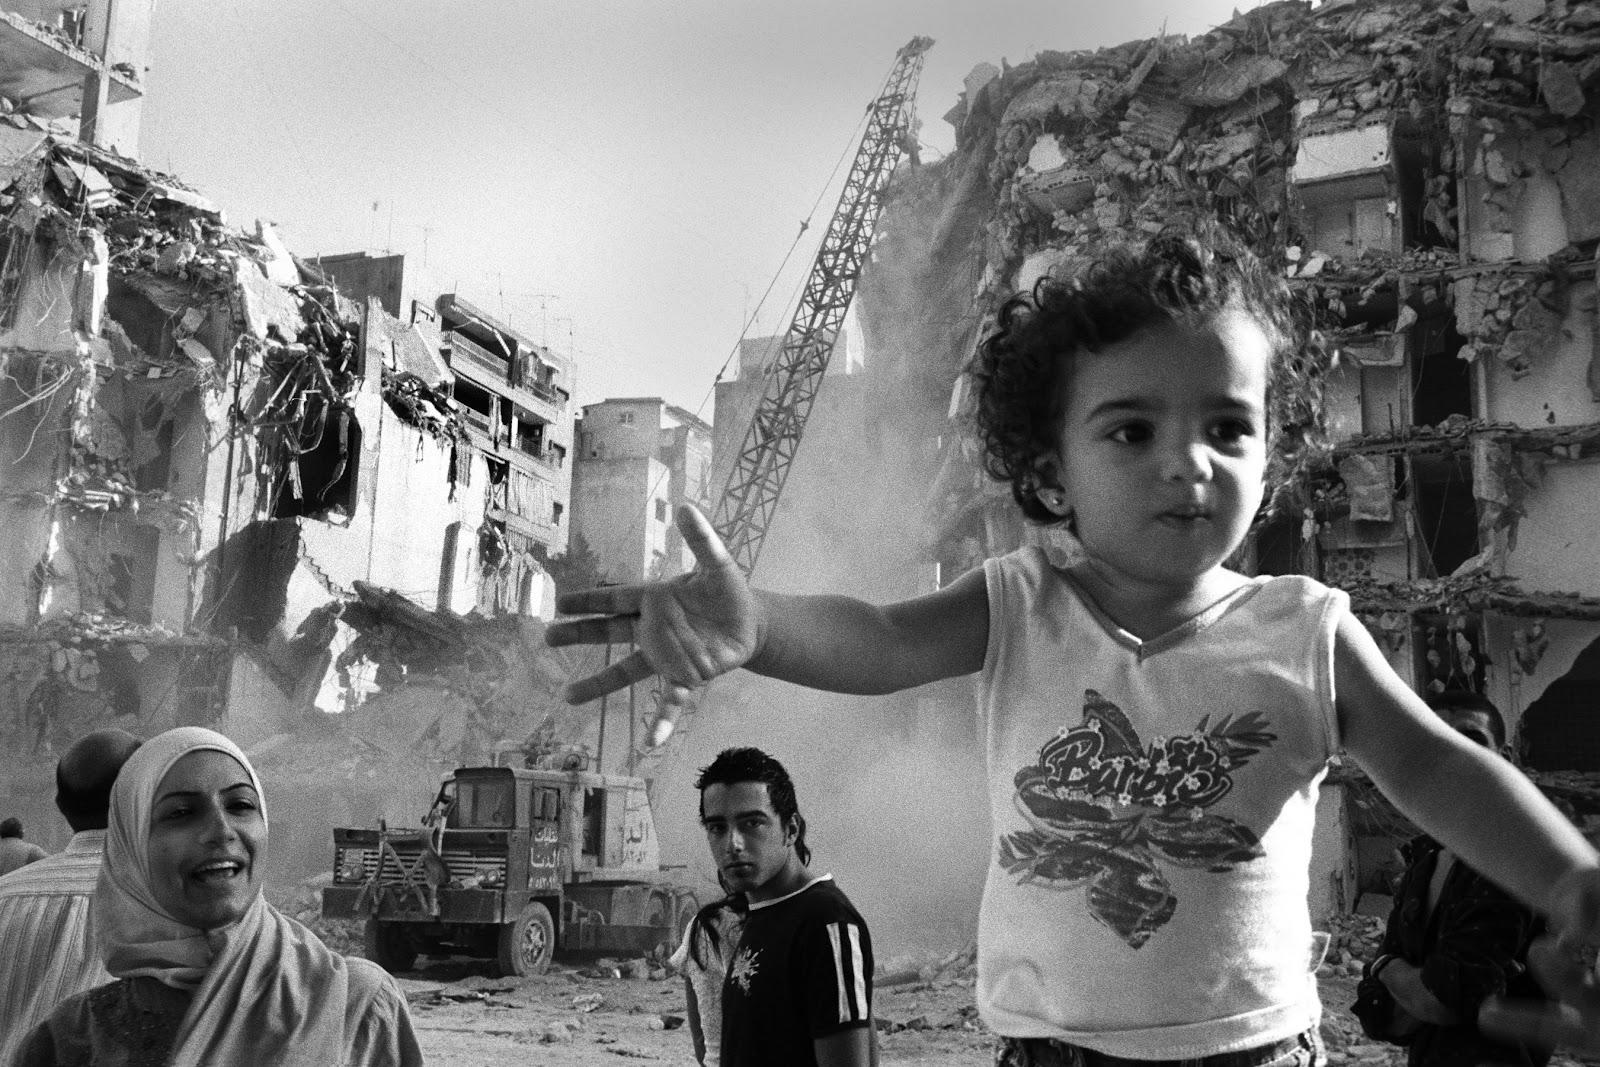 deeRania-Matar-Barbie-Girl-Beirut-2006-Courtesy-Rania-Matar2.jpg